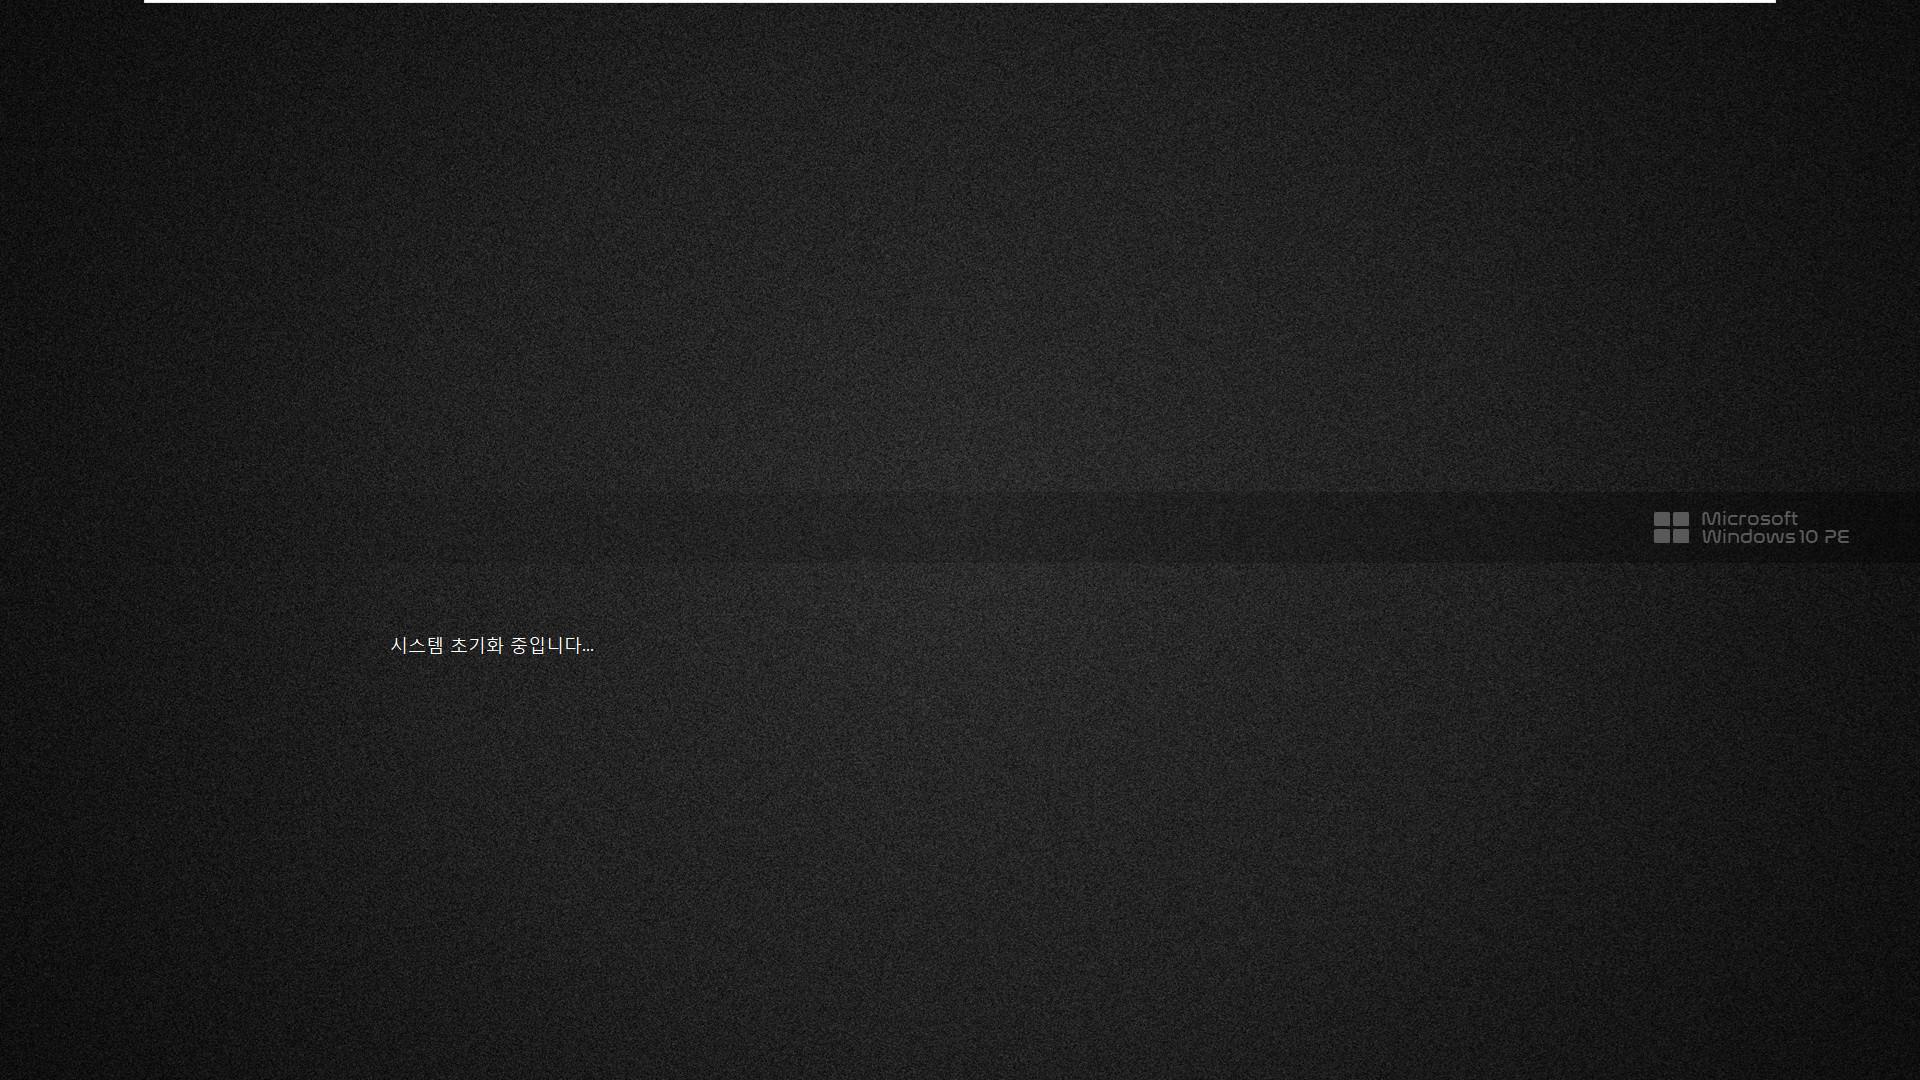 prince pe에 레지스트리 하이브 파일 추가 + 용량 최적화 - Ventoy에 wim 부팅하여 드래그 복사 테스트 2020-09-02_032924.jpg